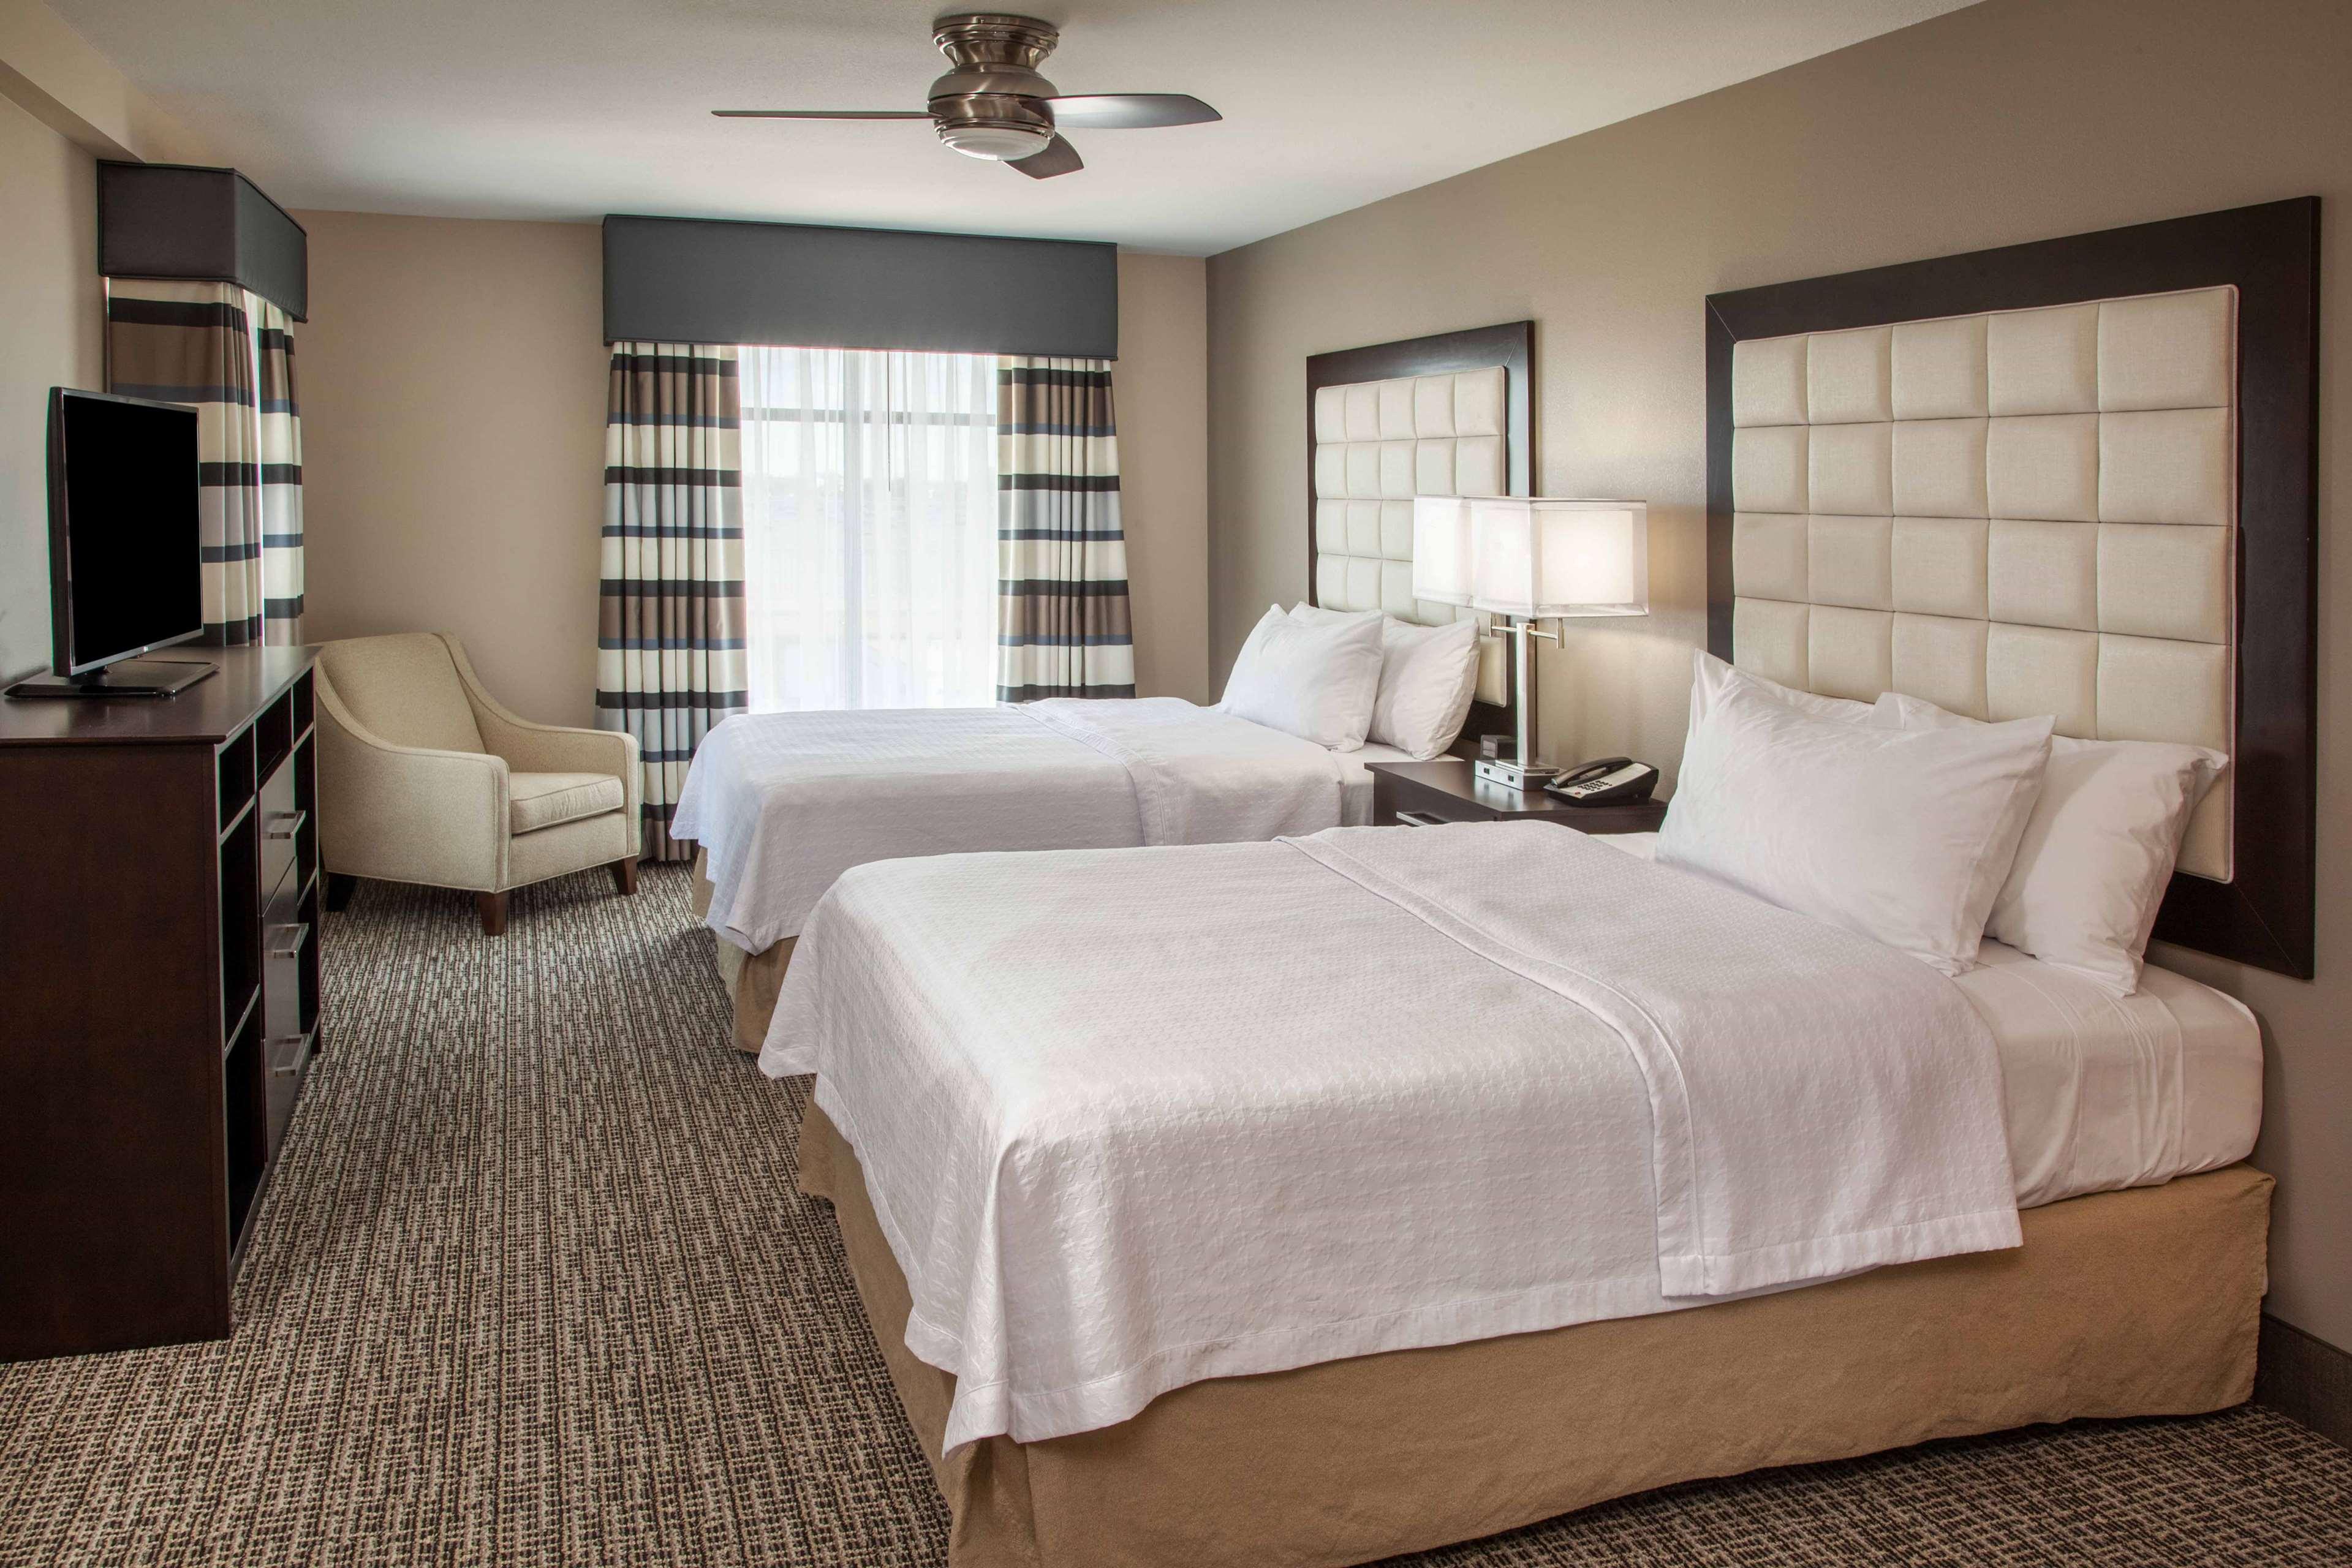 Homewood Suites by Hilton Munster image 2